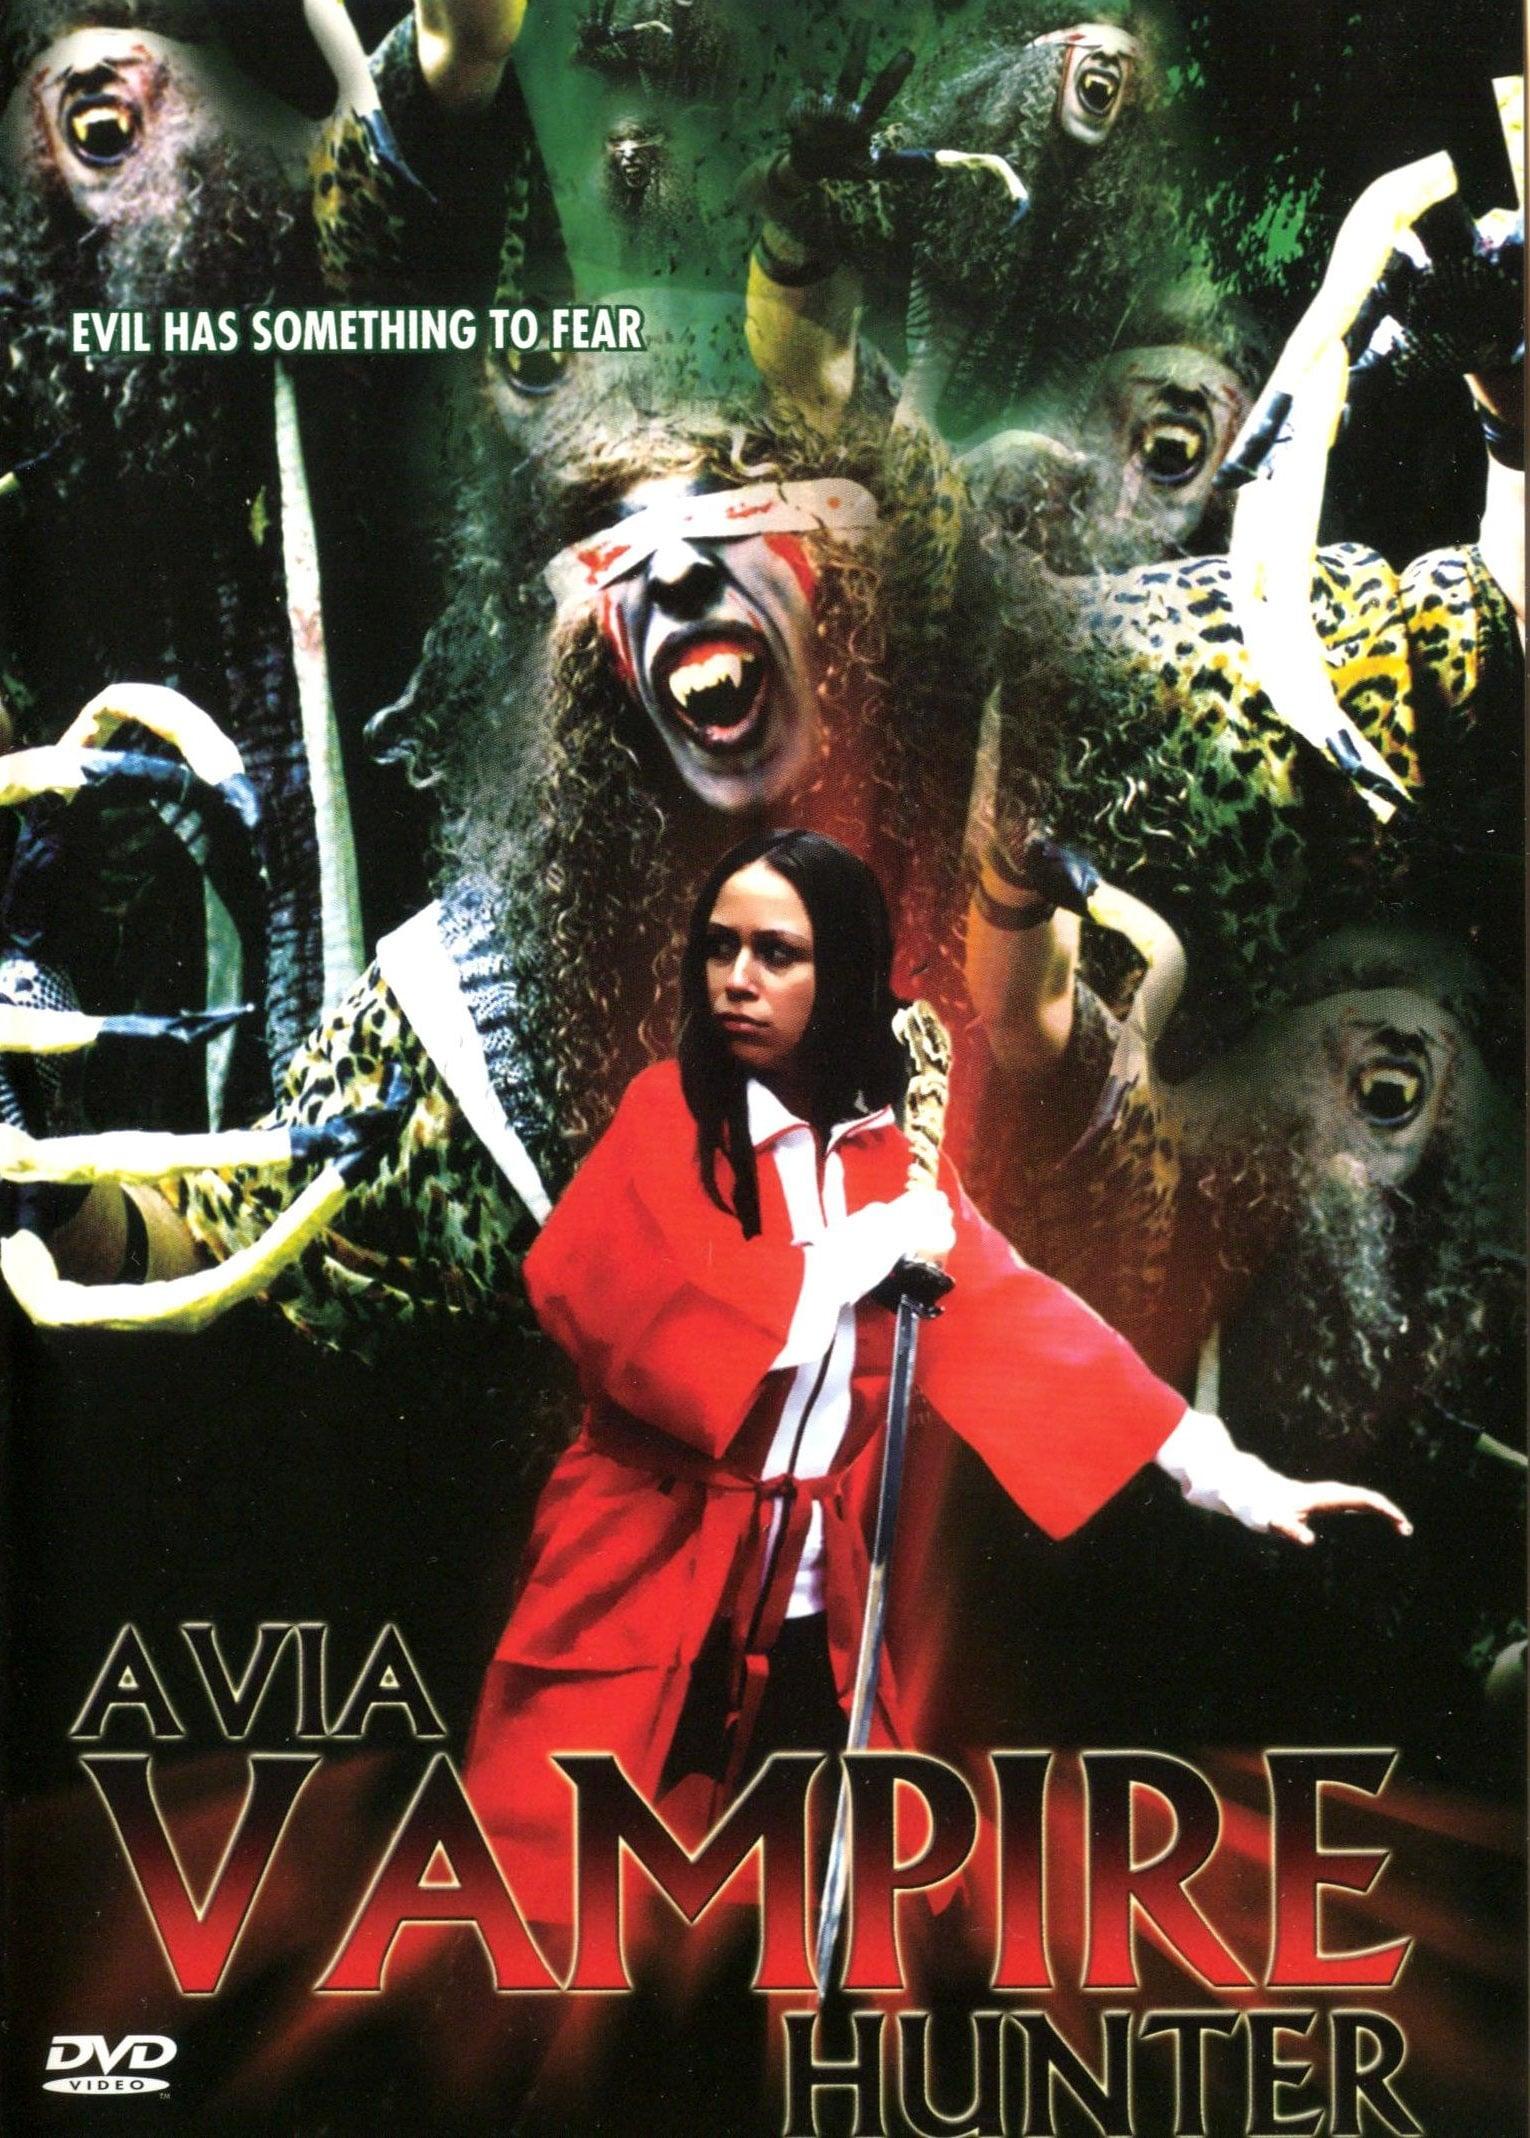 Avia: Vampire Hunter